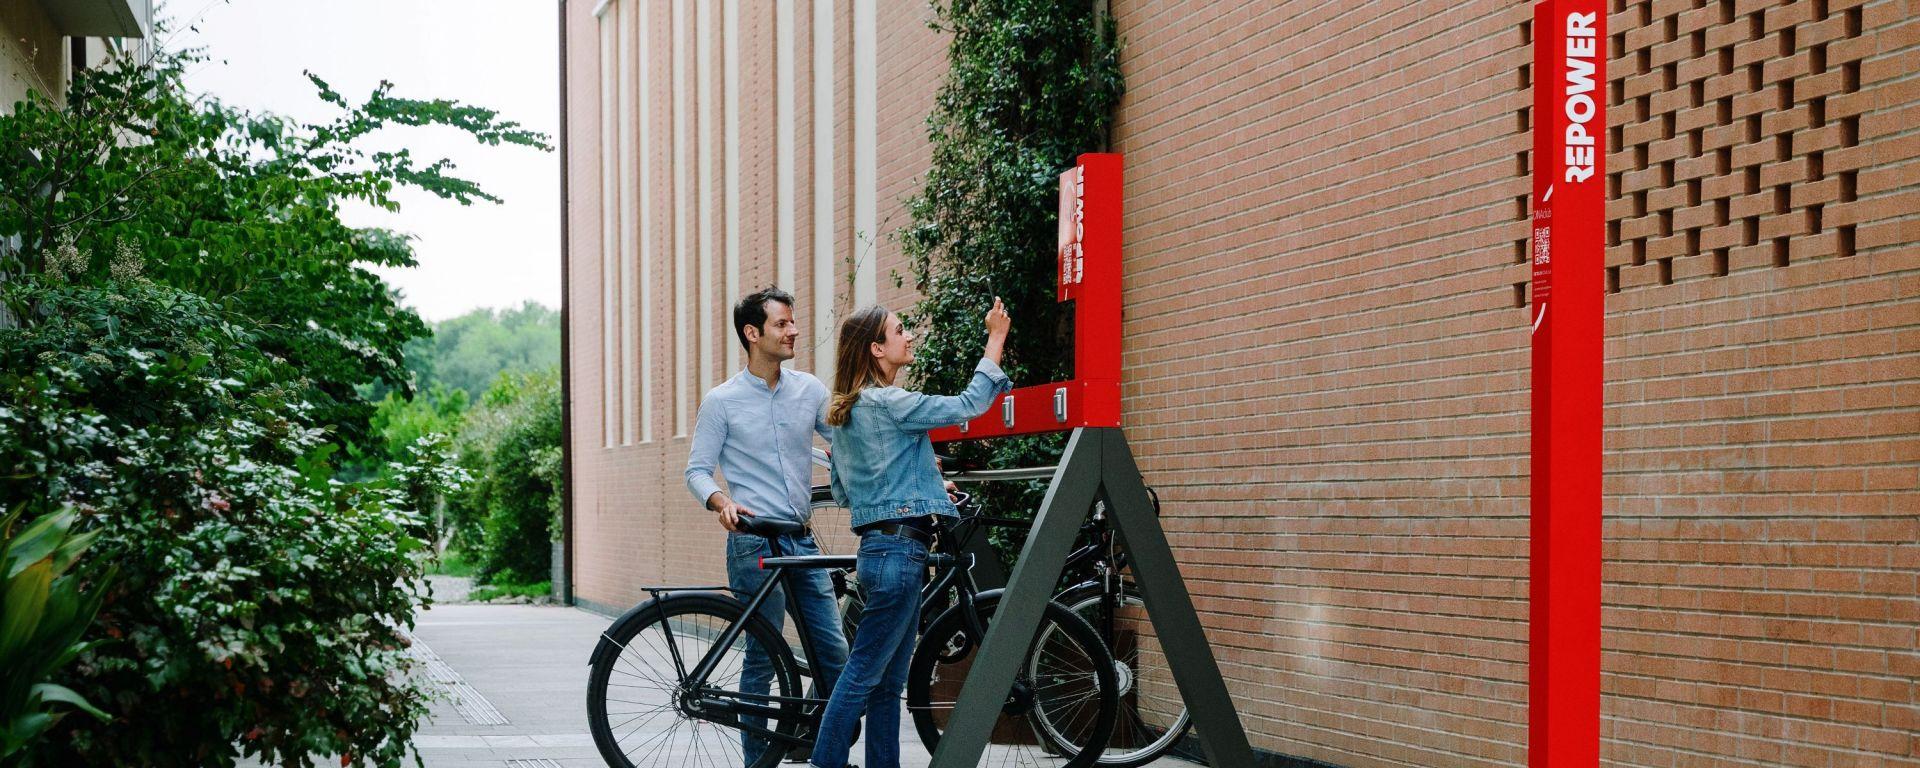 DINAclub, la rete di ricarica per e-bike di Repower